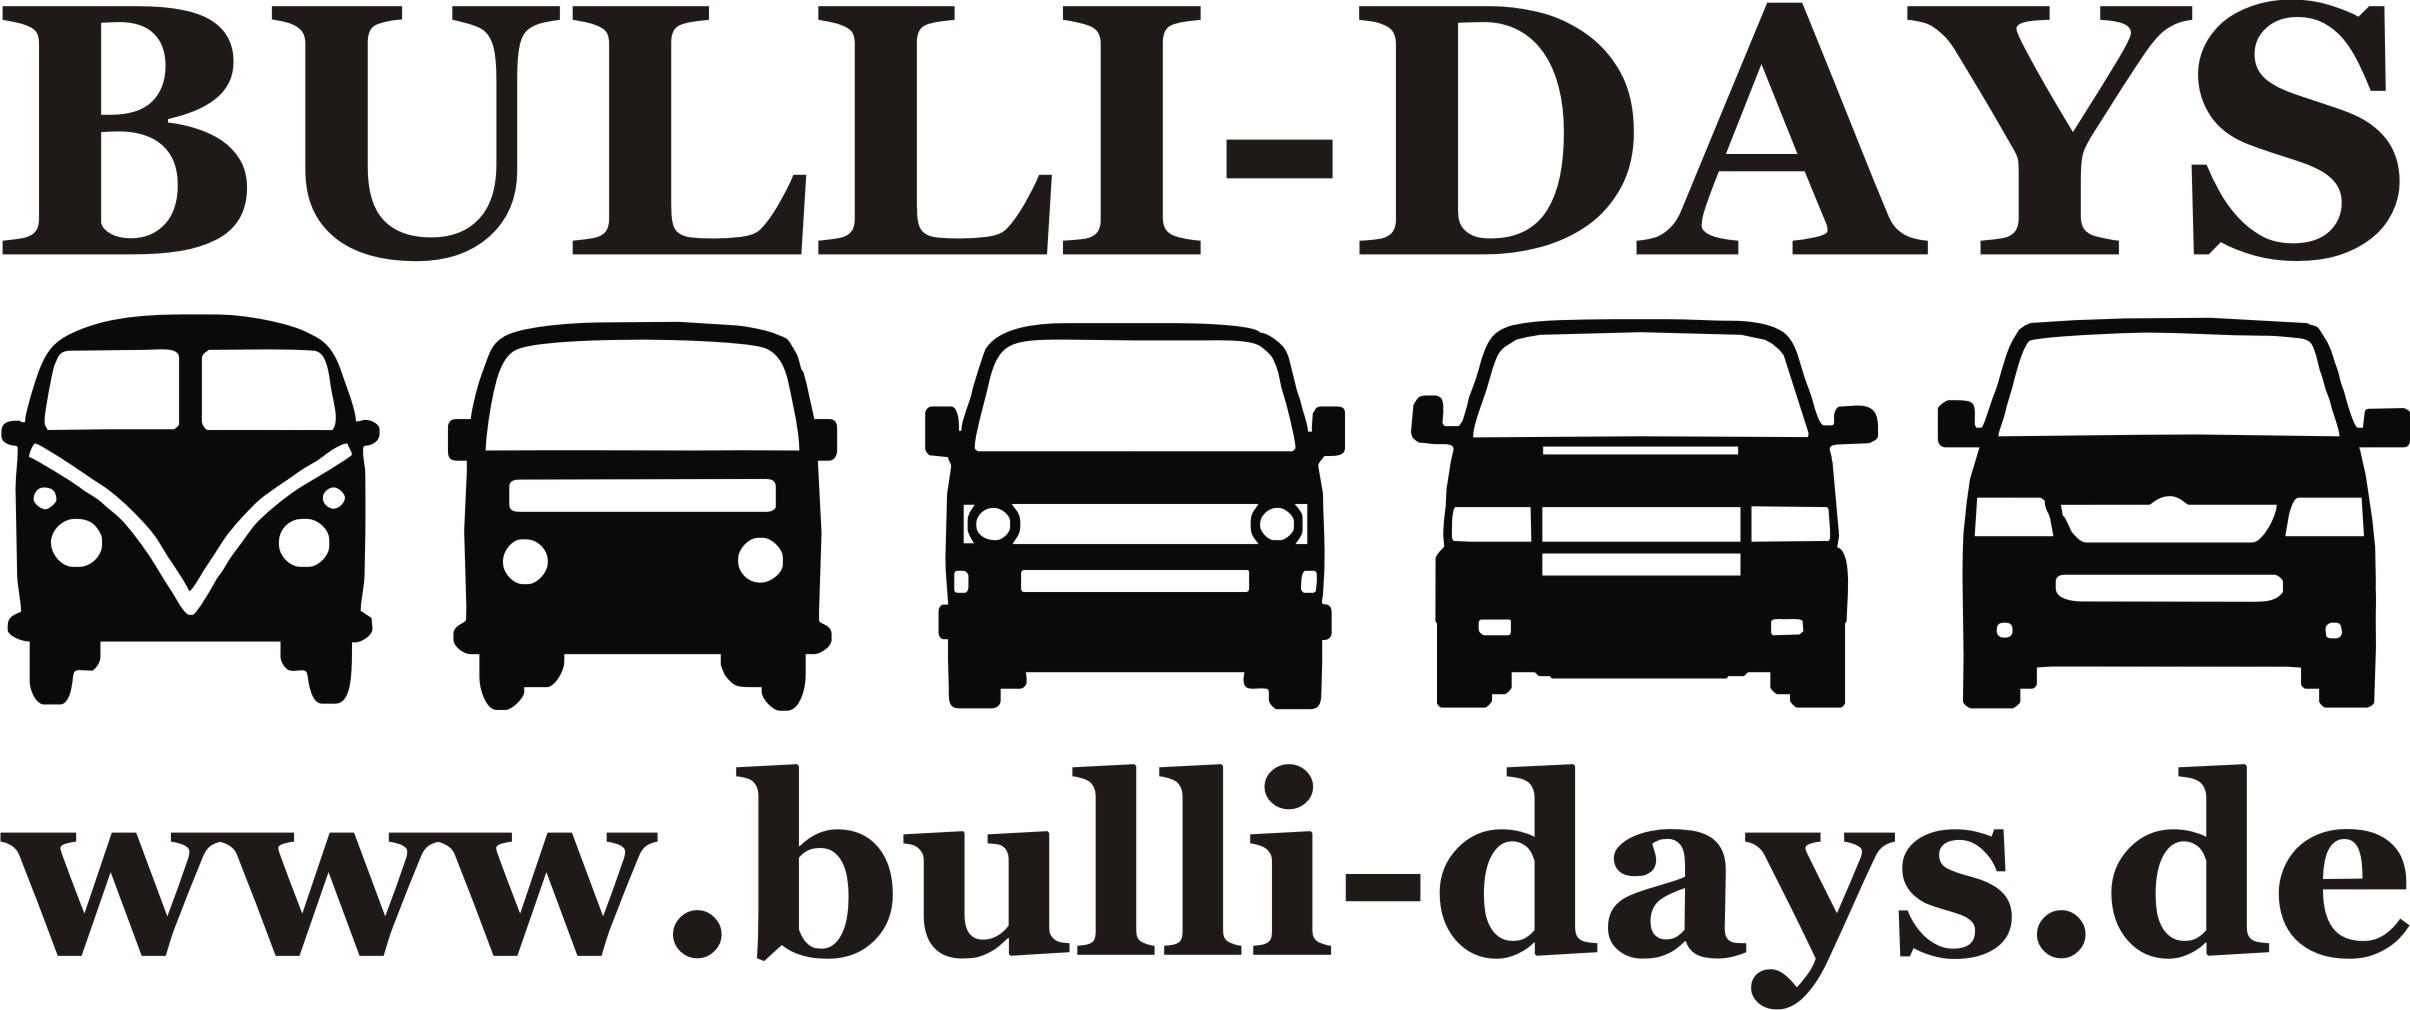 Bulli-Days 2013 am Edersee 03.05. - 05.05.2013